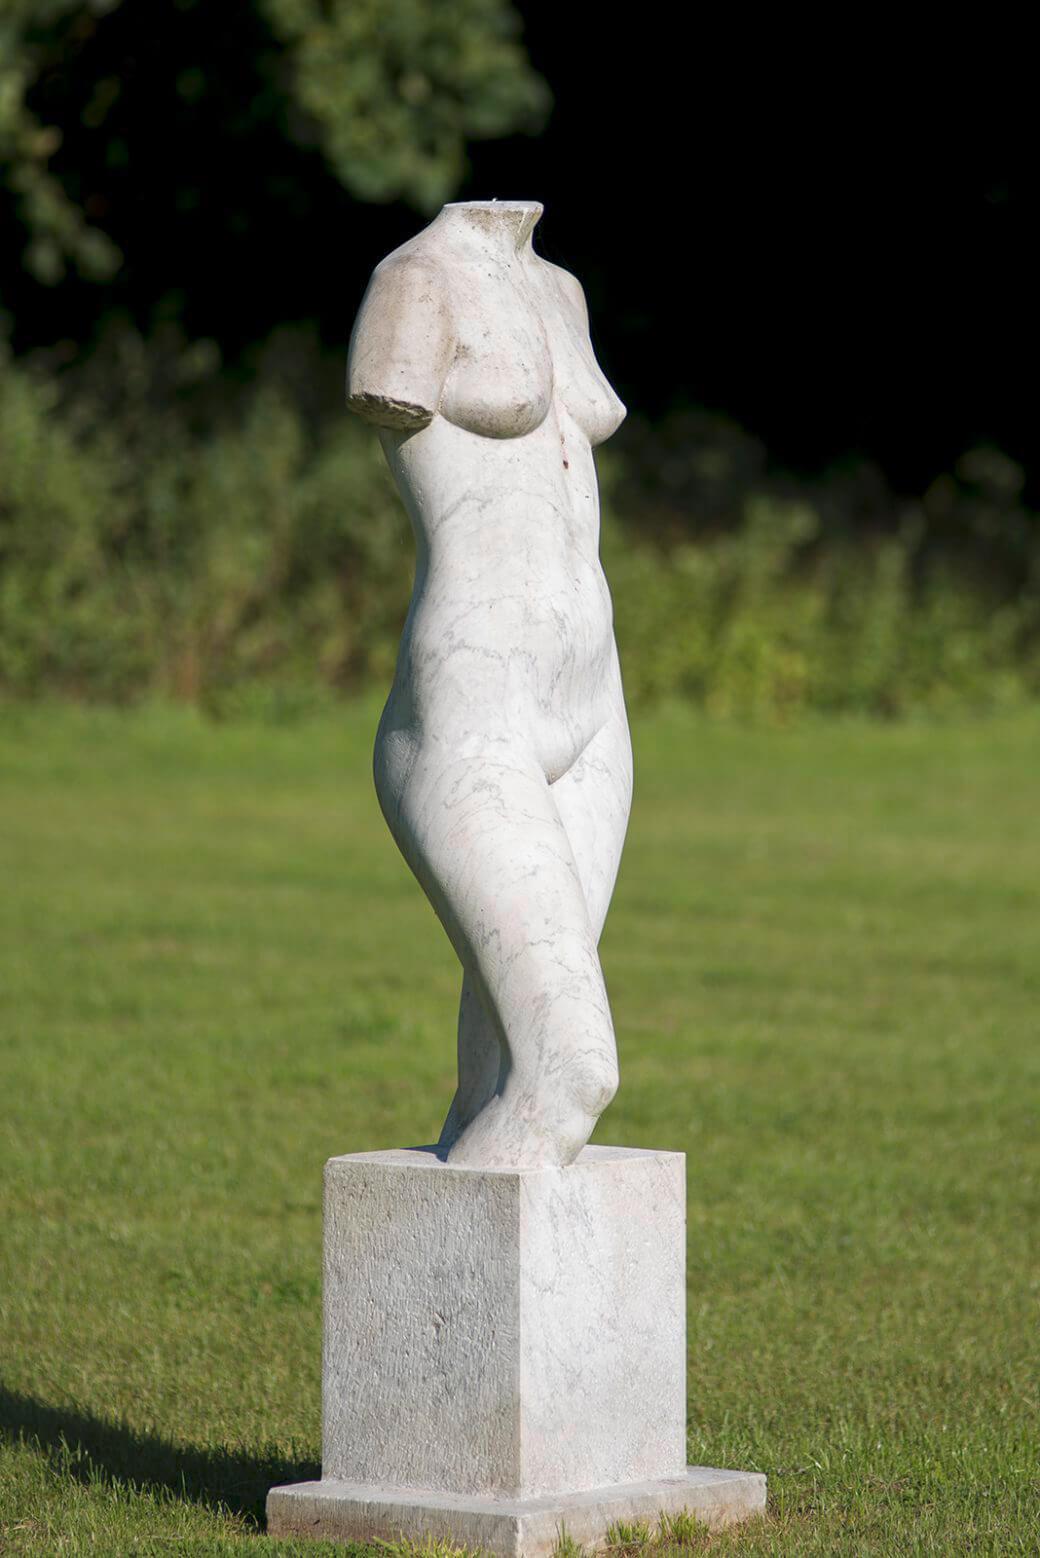 Klaus Kütemeier: Stehender weiblicher Torso, (Foto: KUNST@SH/Jan Petersen)